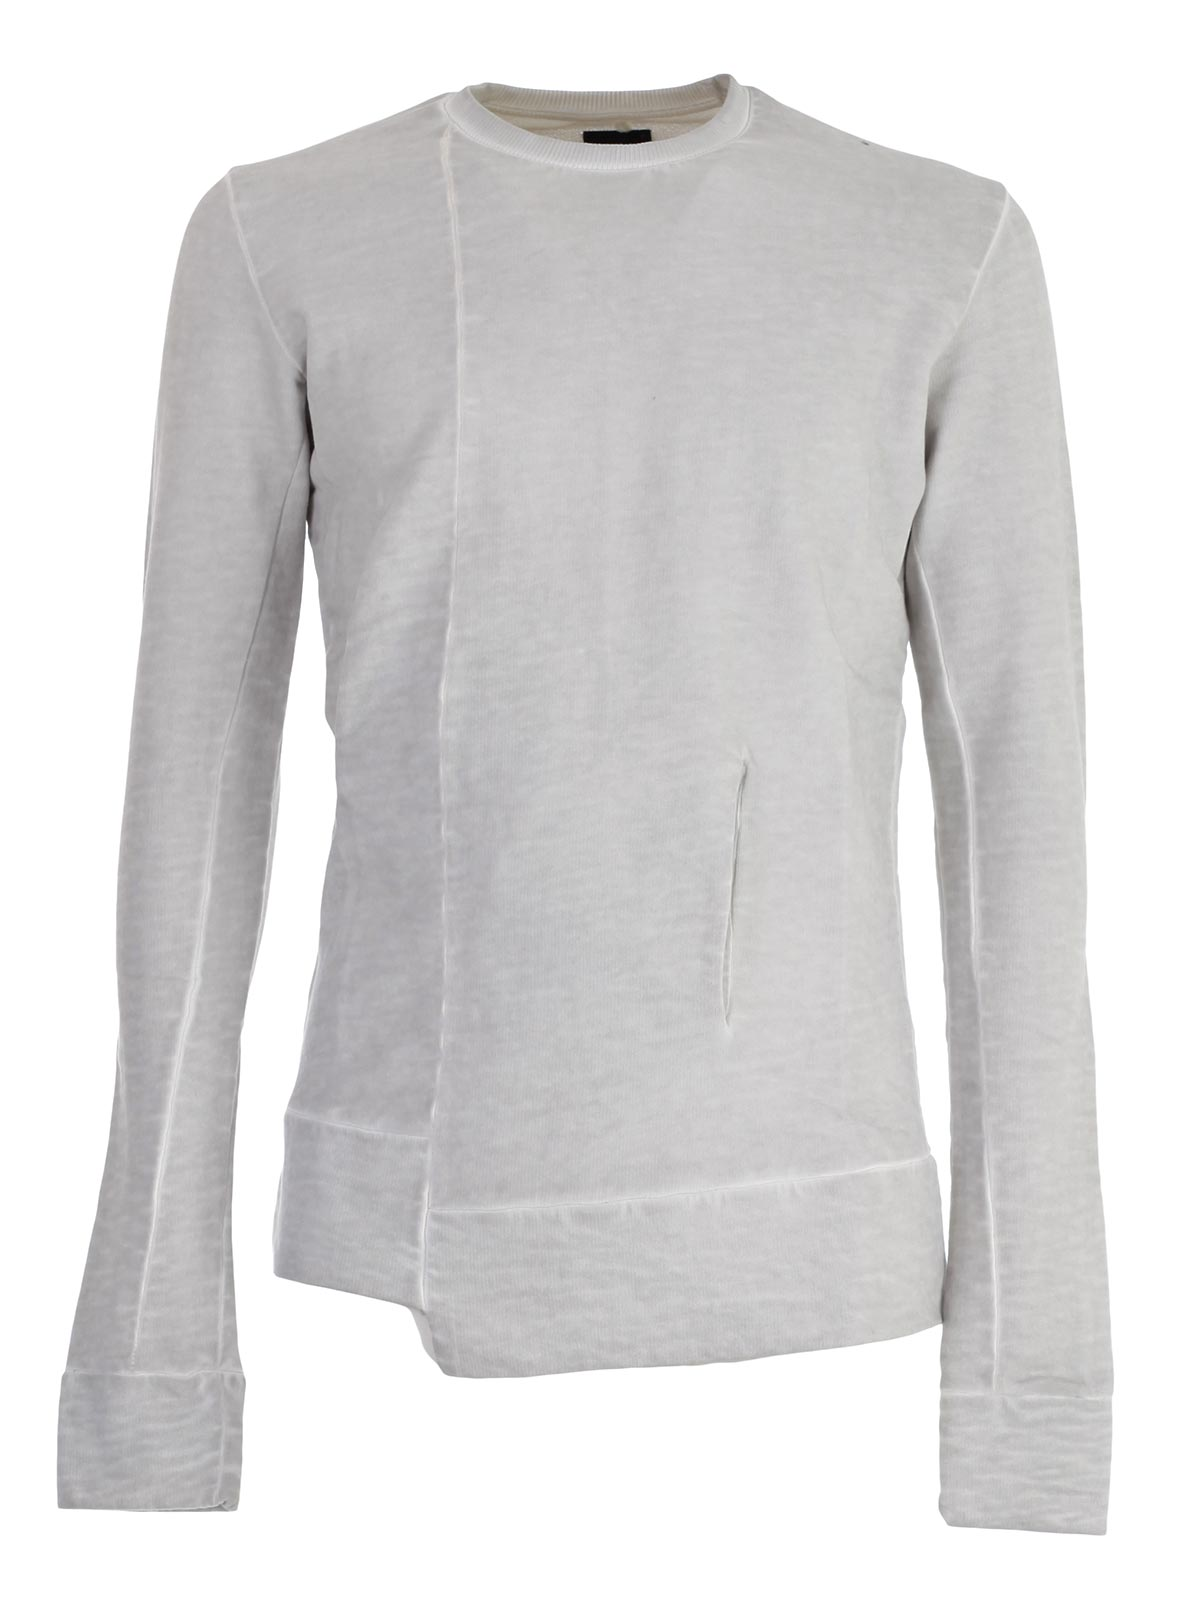 Picture of THOM KROM SweatShirt